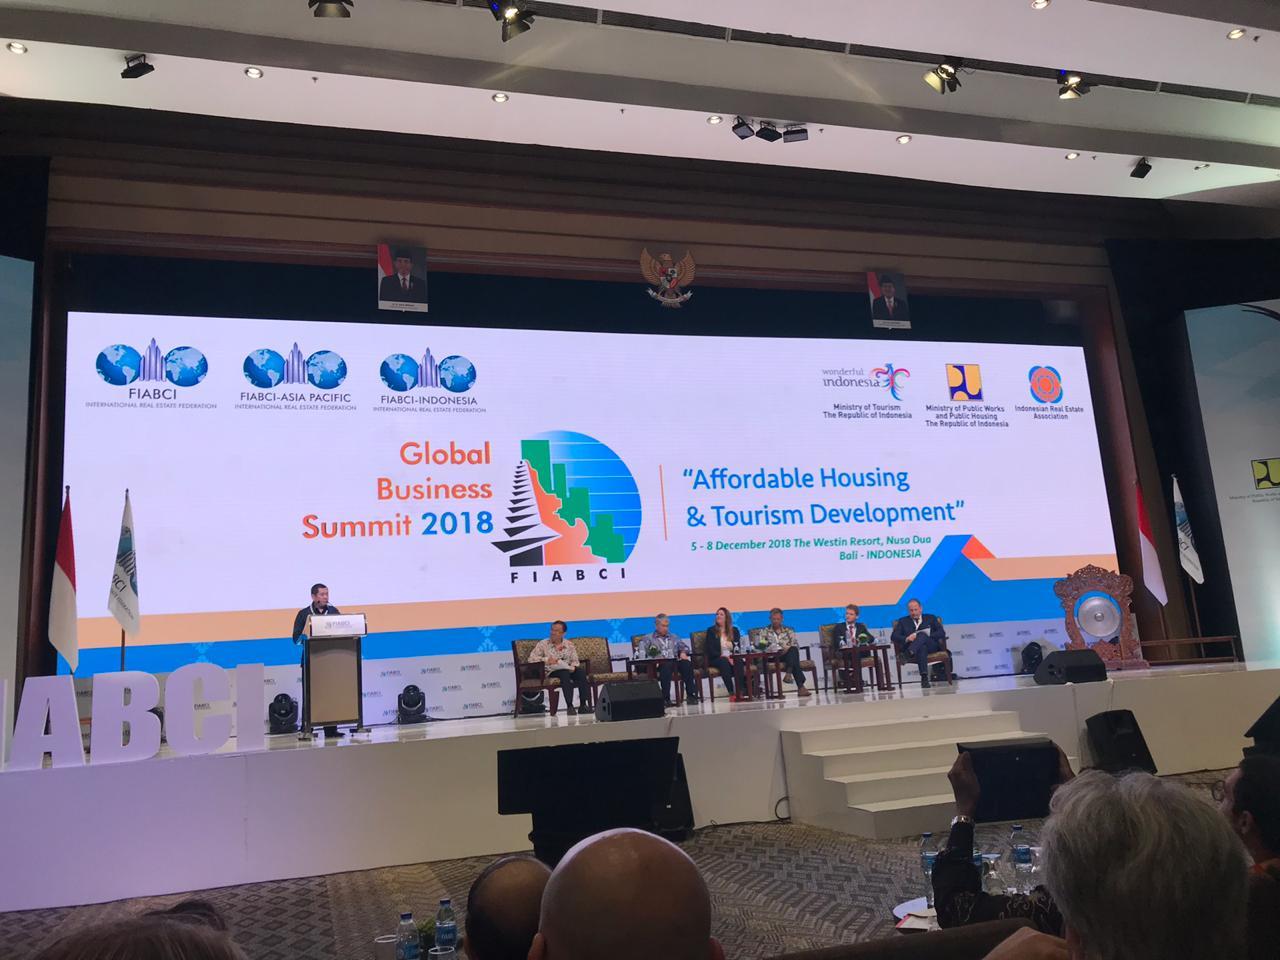 https: img-o.okeinfo.net content 2018 12 08 470 1988451 fiabci-summit-pertama-digelar-di-indonesia-rei-tawarkan-investasi-rp68-triliun-9y63ztLH0C.jpg